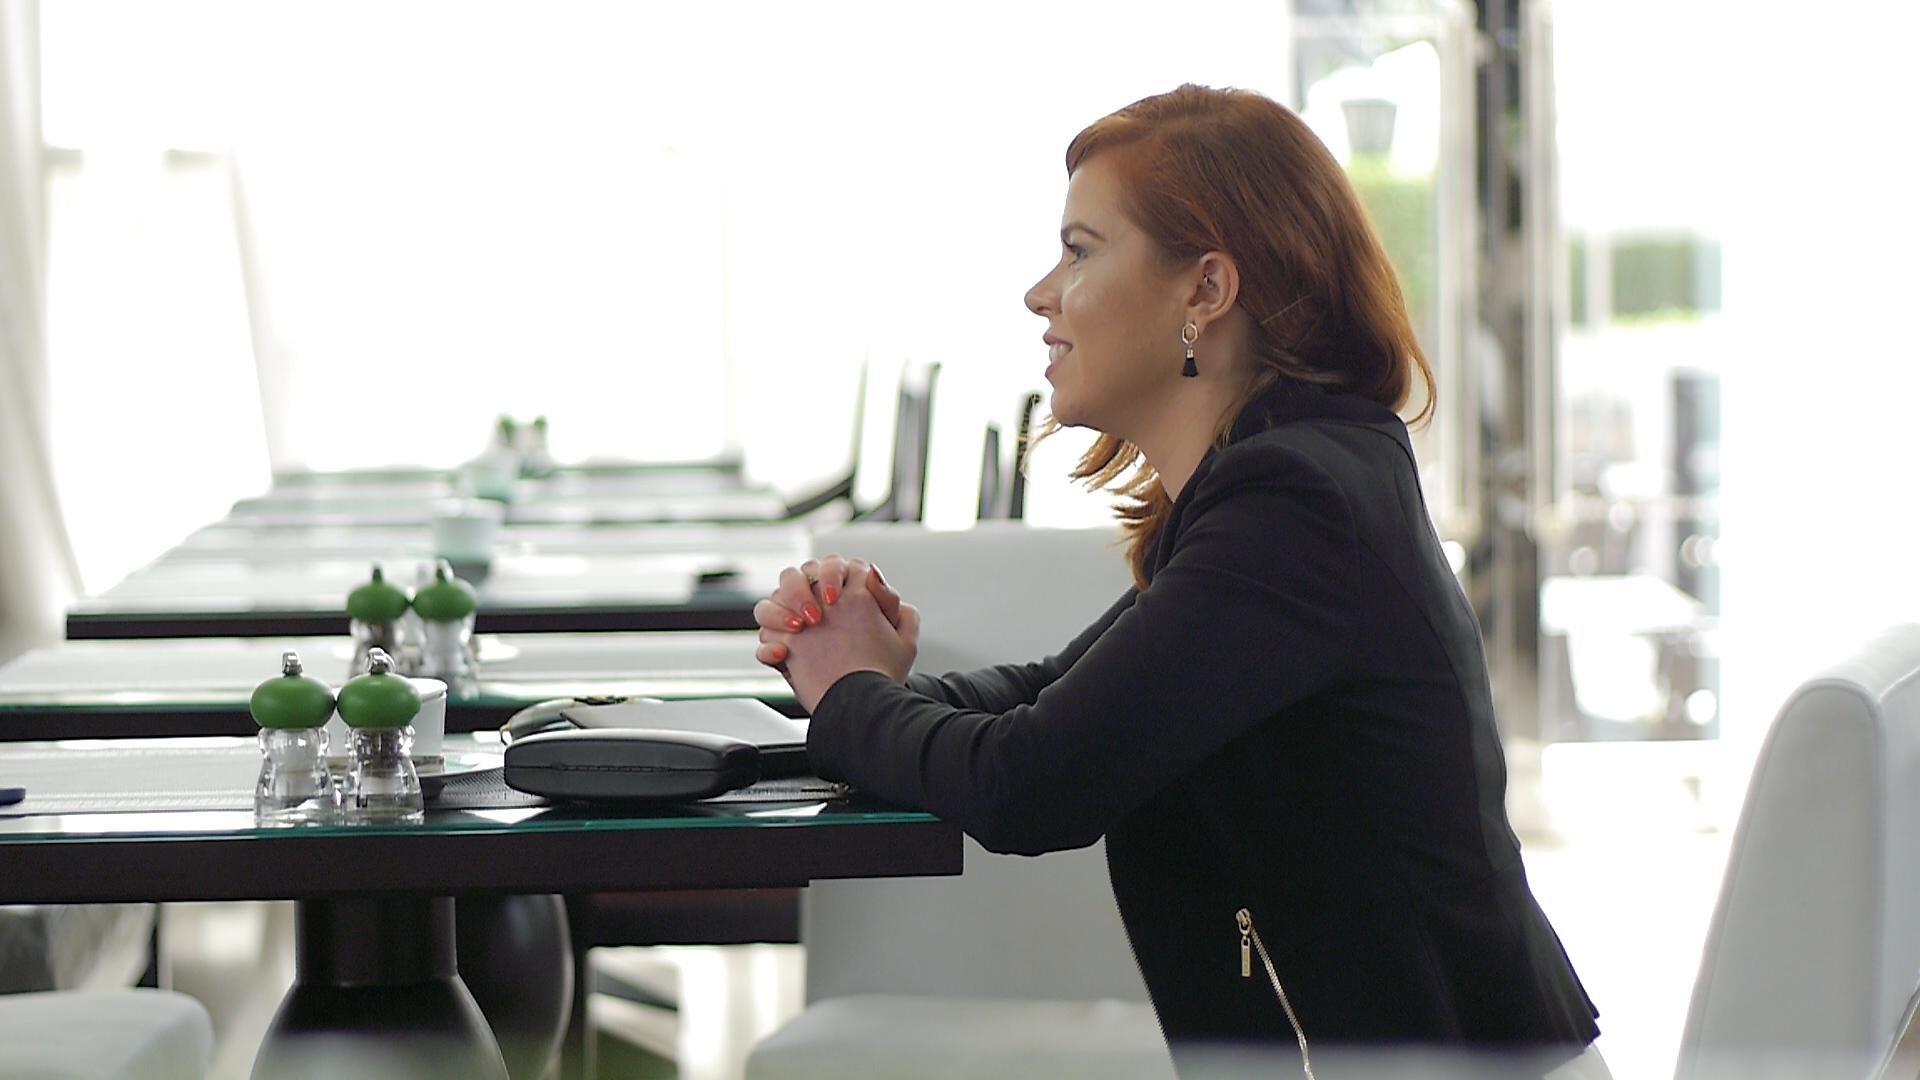 business meeting tips - briar prestidge - deals in high heels